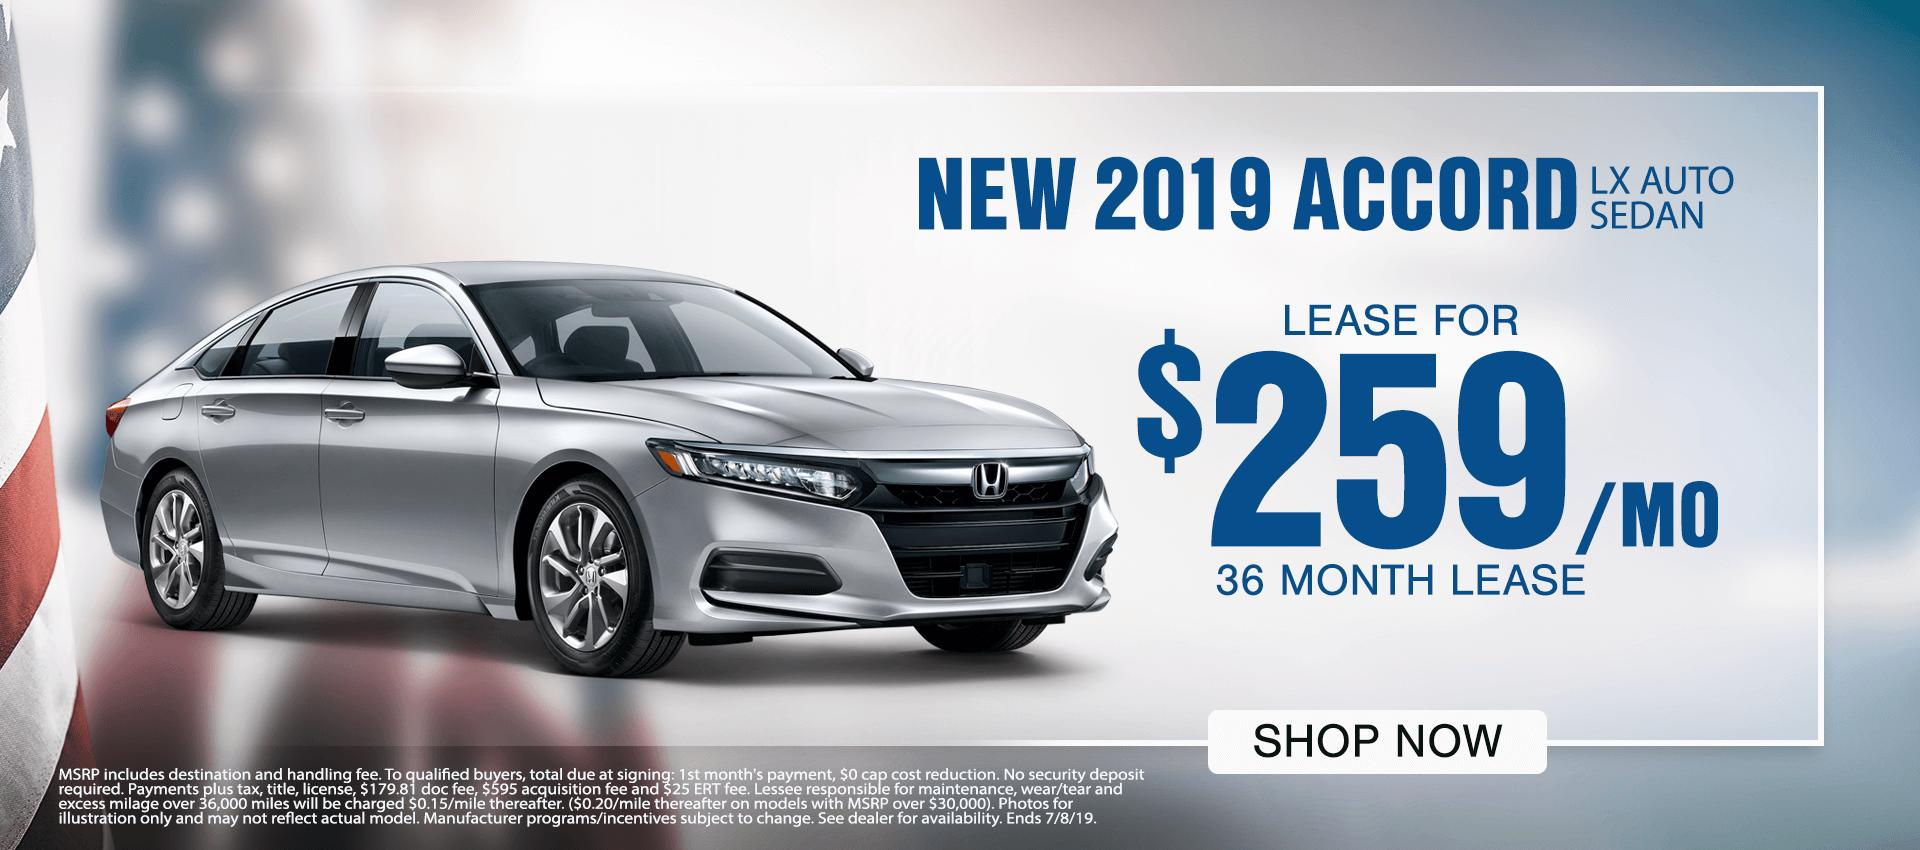 2019 Accord LX Auto Sedan